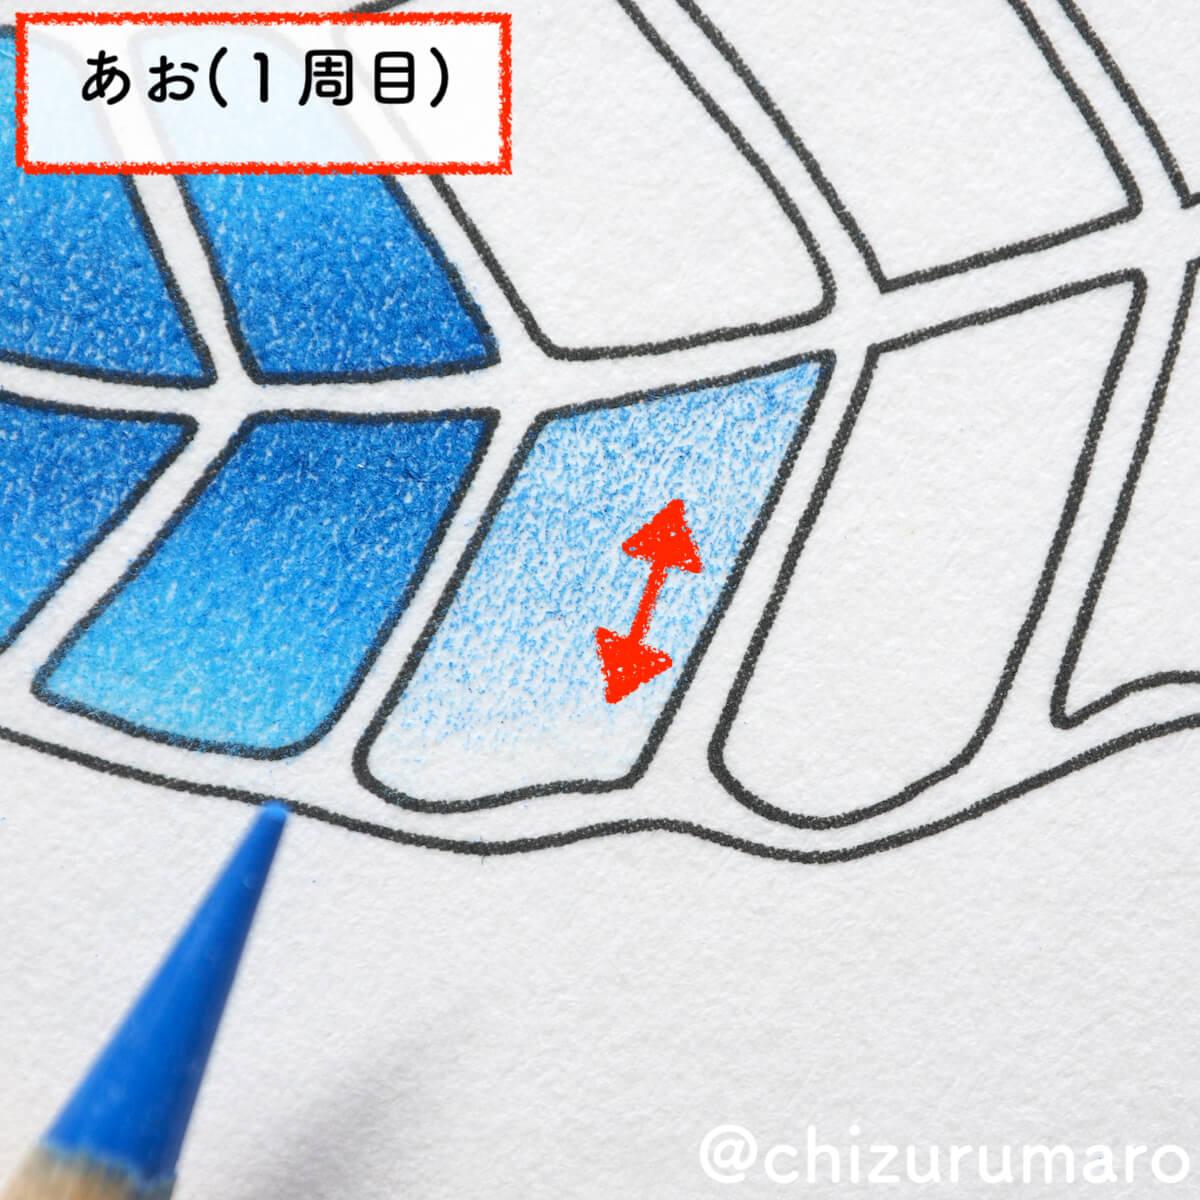 f:id:chizurumaro:20200616104550j:plain